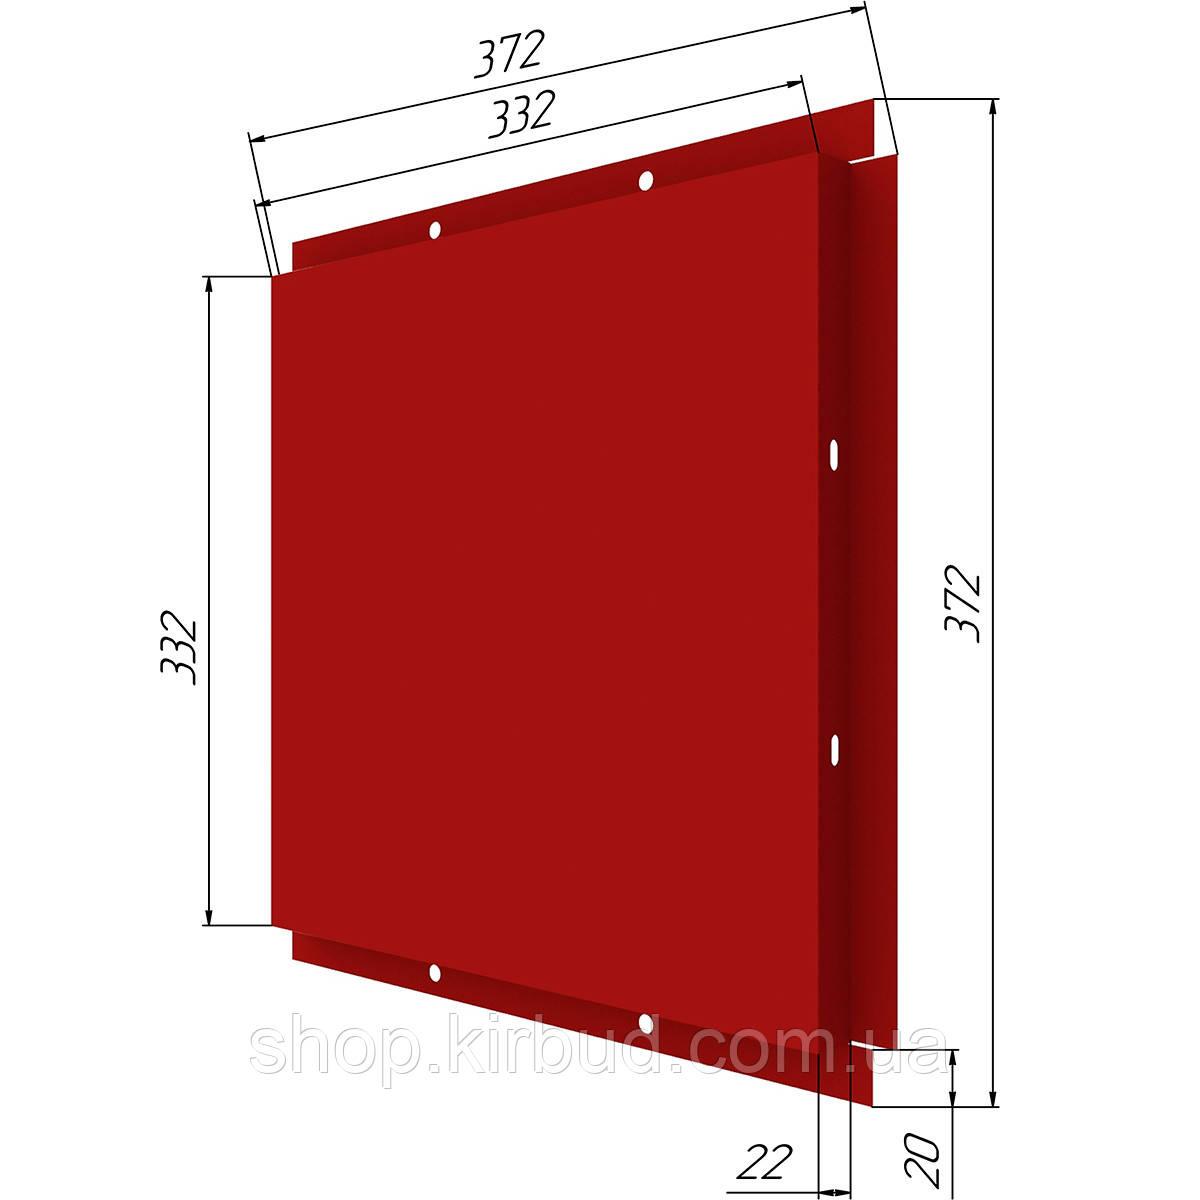 Фасадные касети (под заказ) оцинкованые 0,50мм 372х372мм